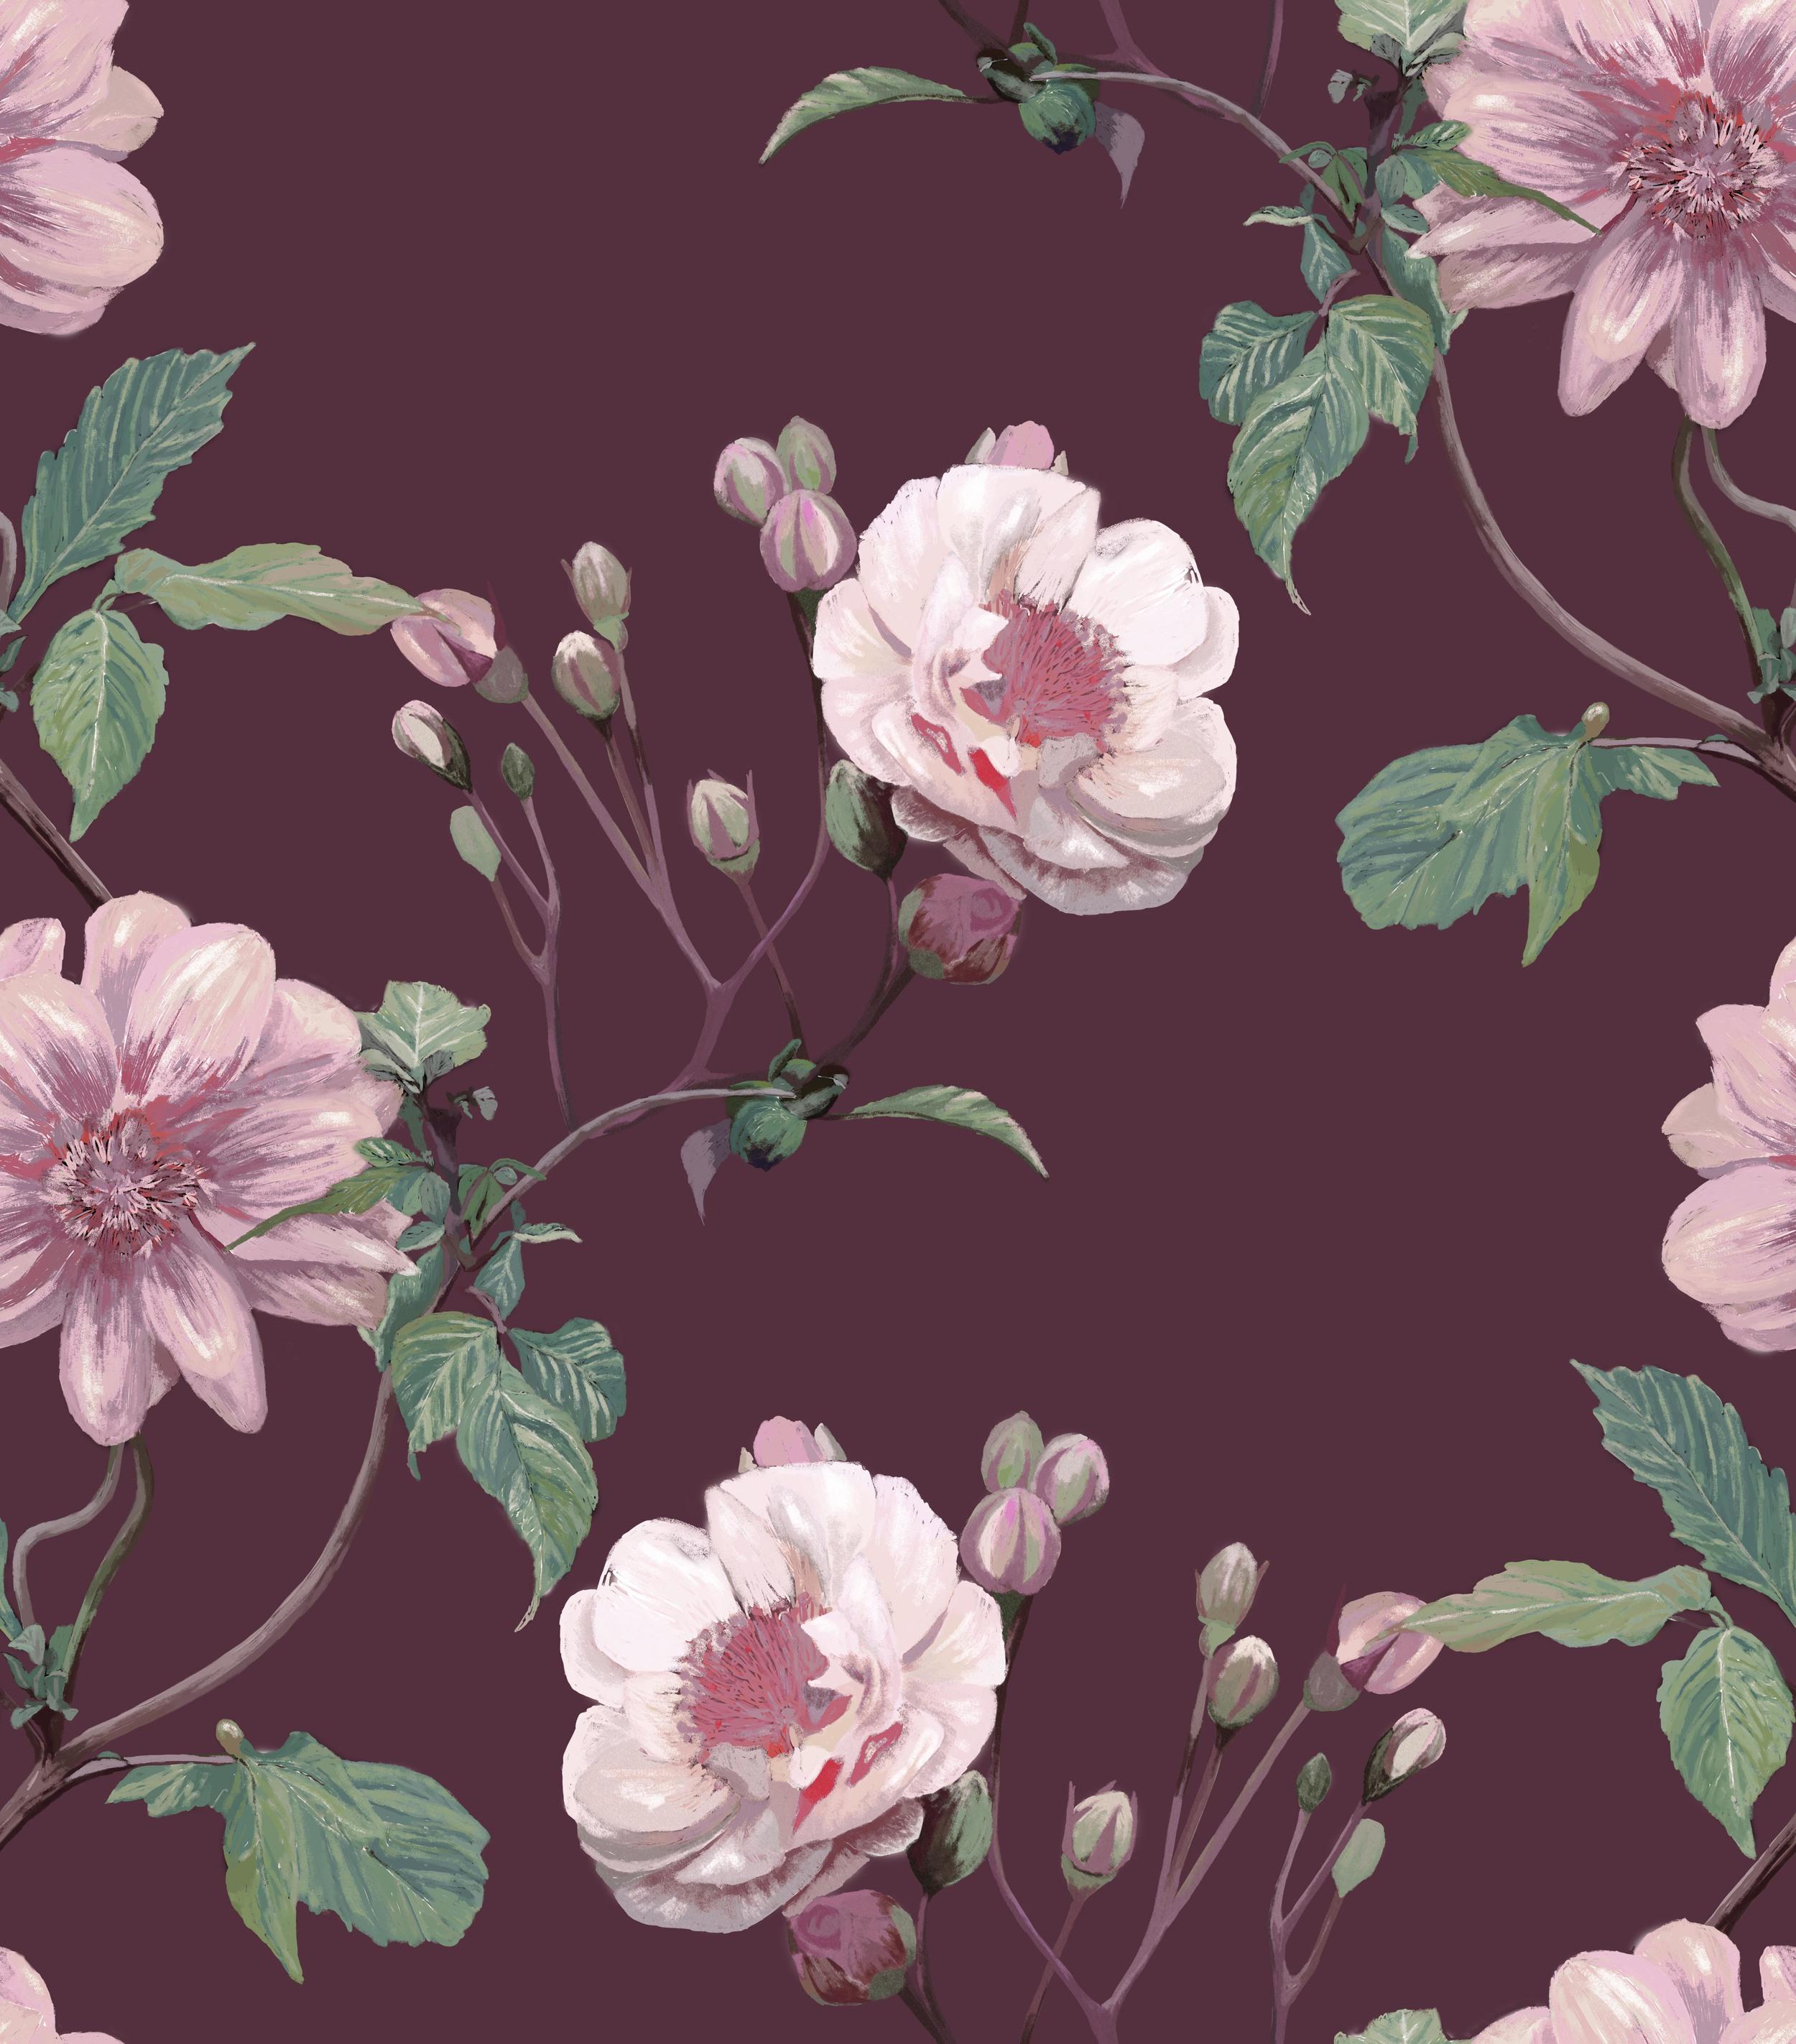 jumbo bloom luxe.jpg